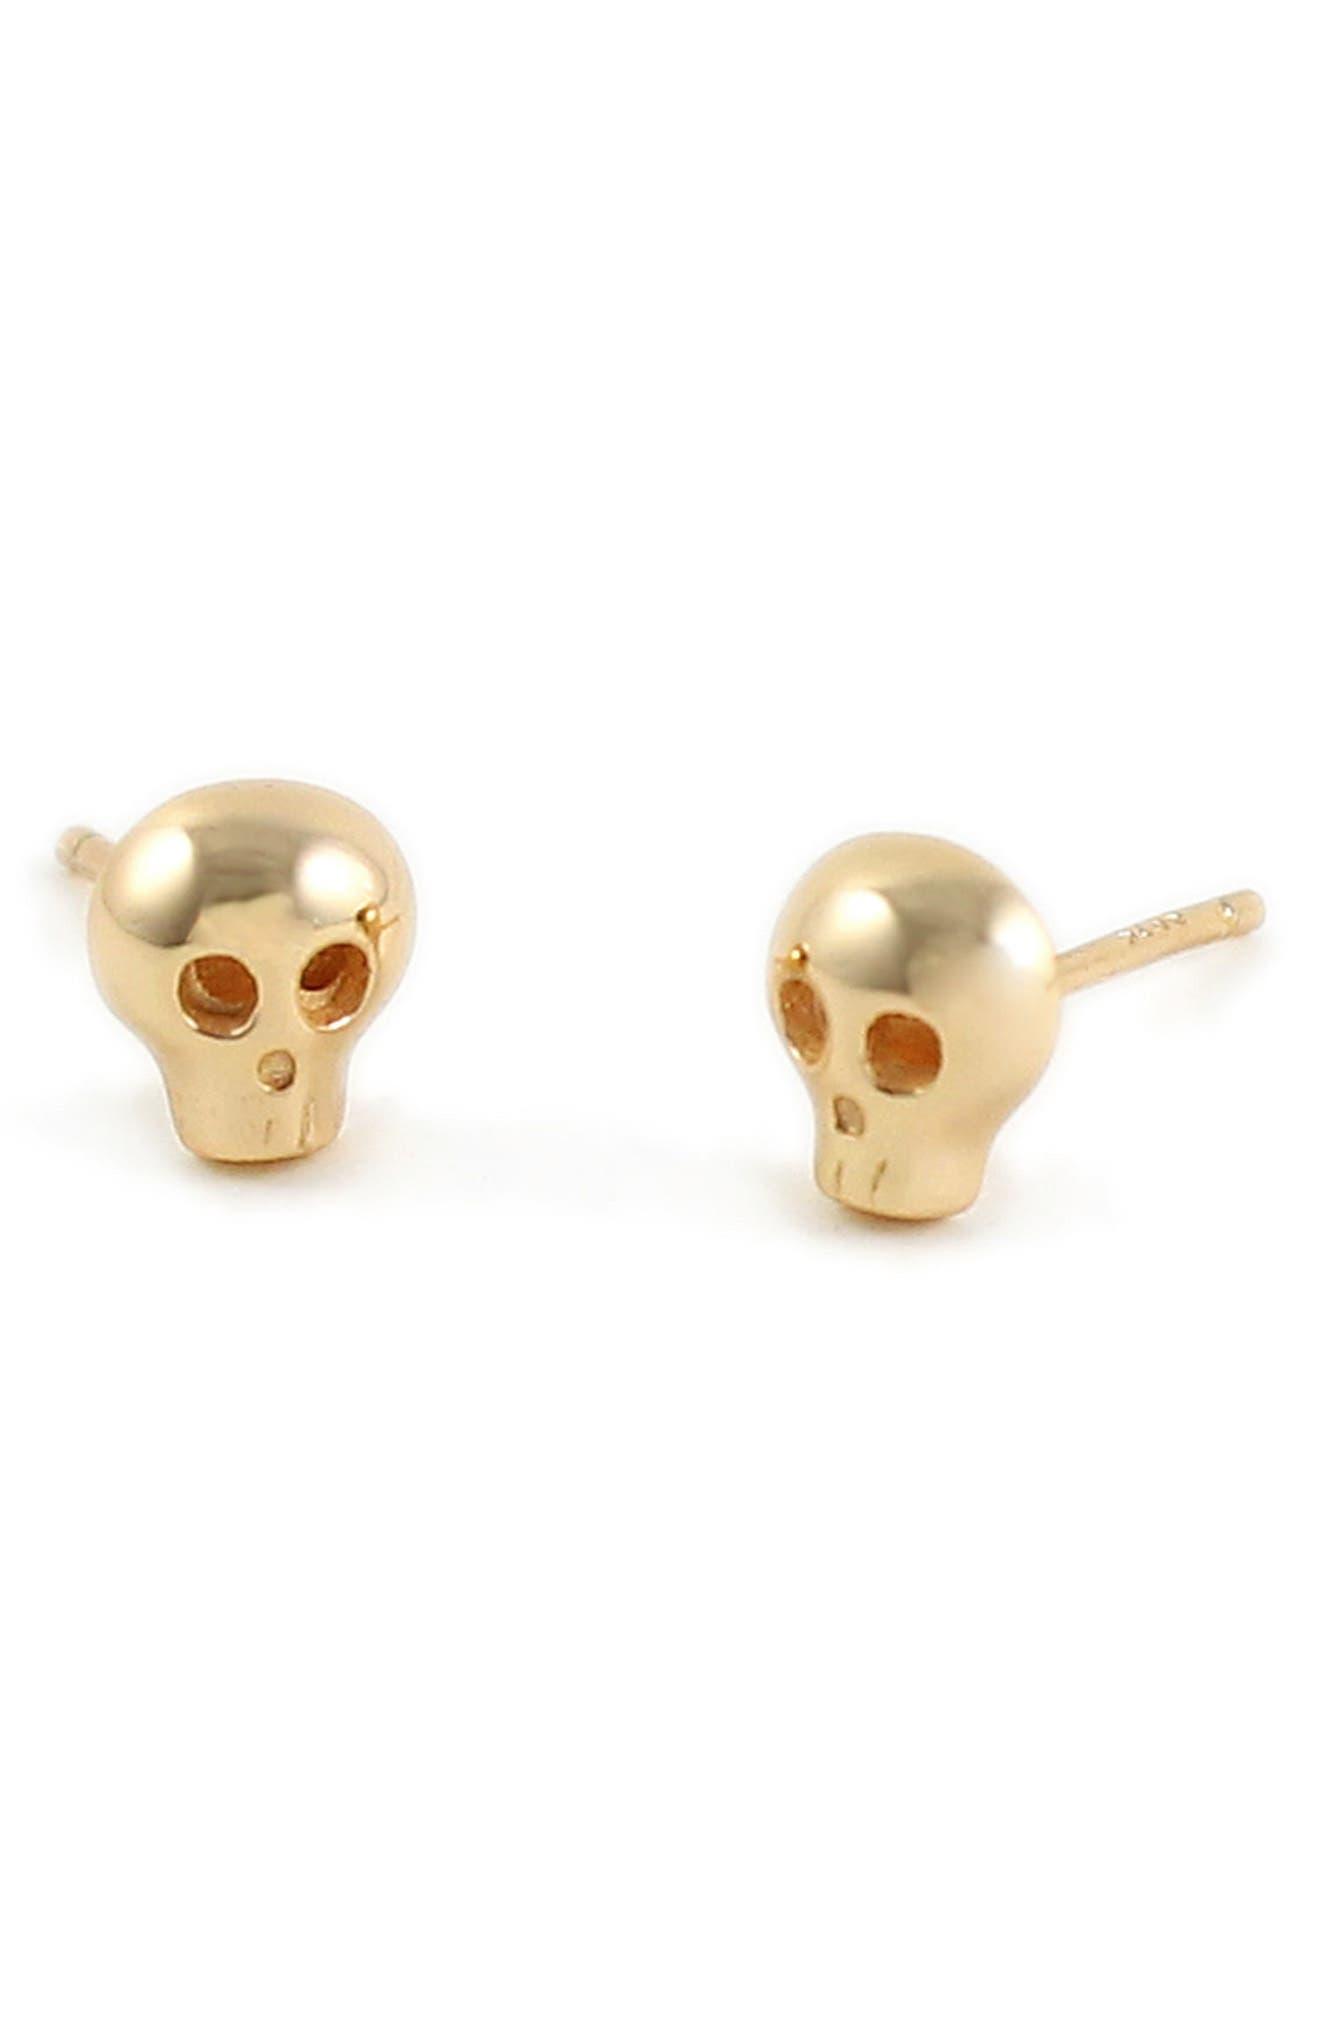 Alternate Image 1 Selected - Kris Nations Skull Stud Earrings